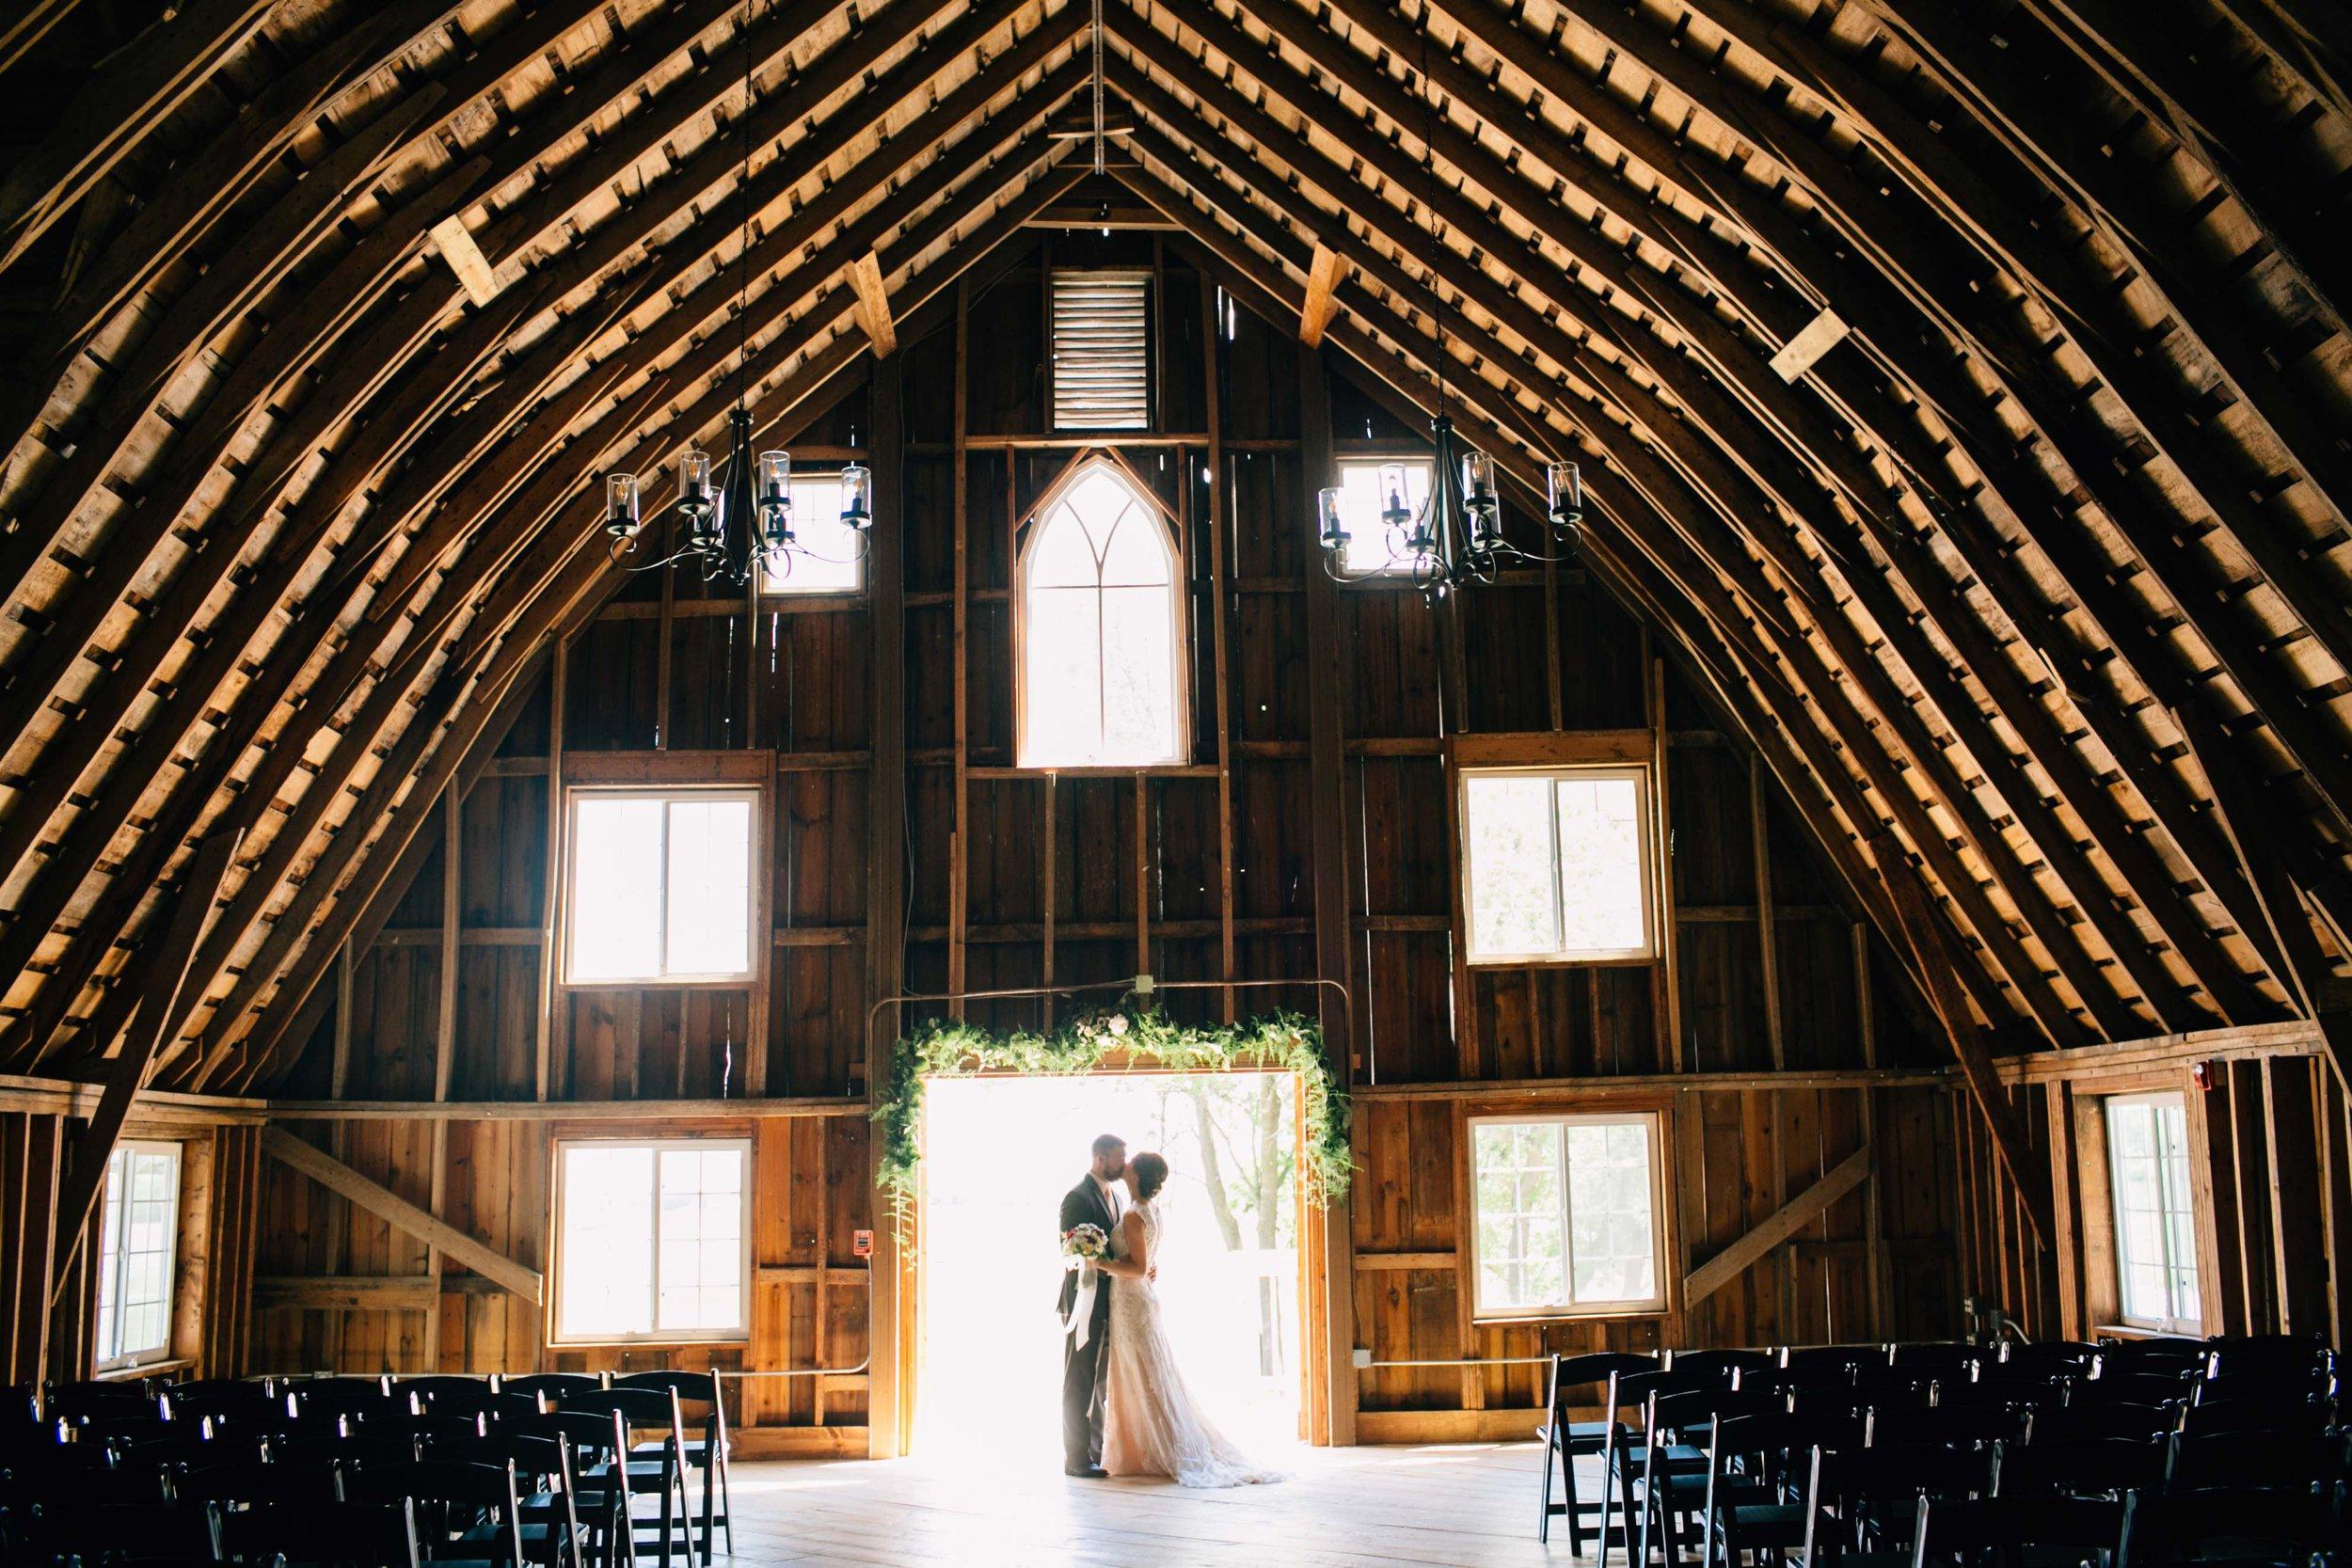 Mark Fierst Minneapolis Wedding Photographer | Sixpence Standard blog post | inside the Bloom Lake Barn in Shafer, MN